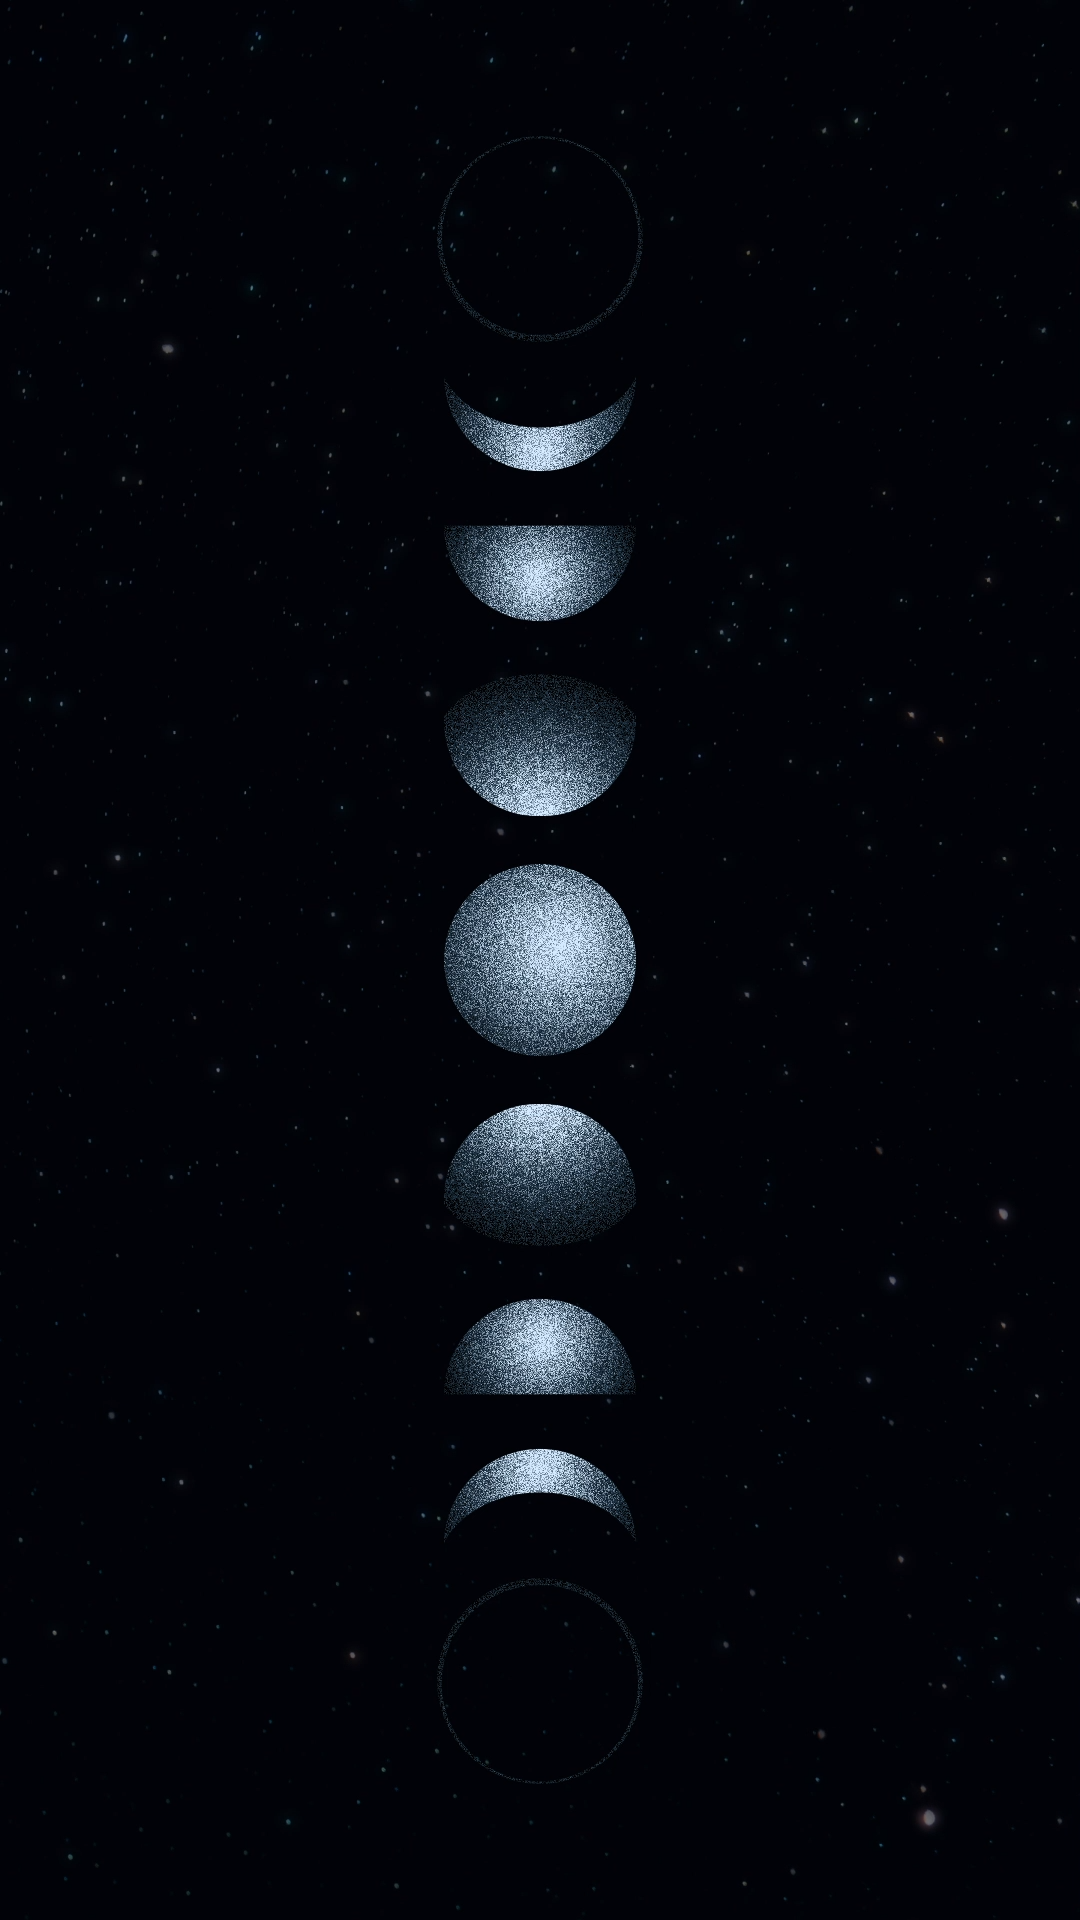 Moon, stars & night sky |an animated Instagram Set by ana & yvy